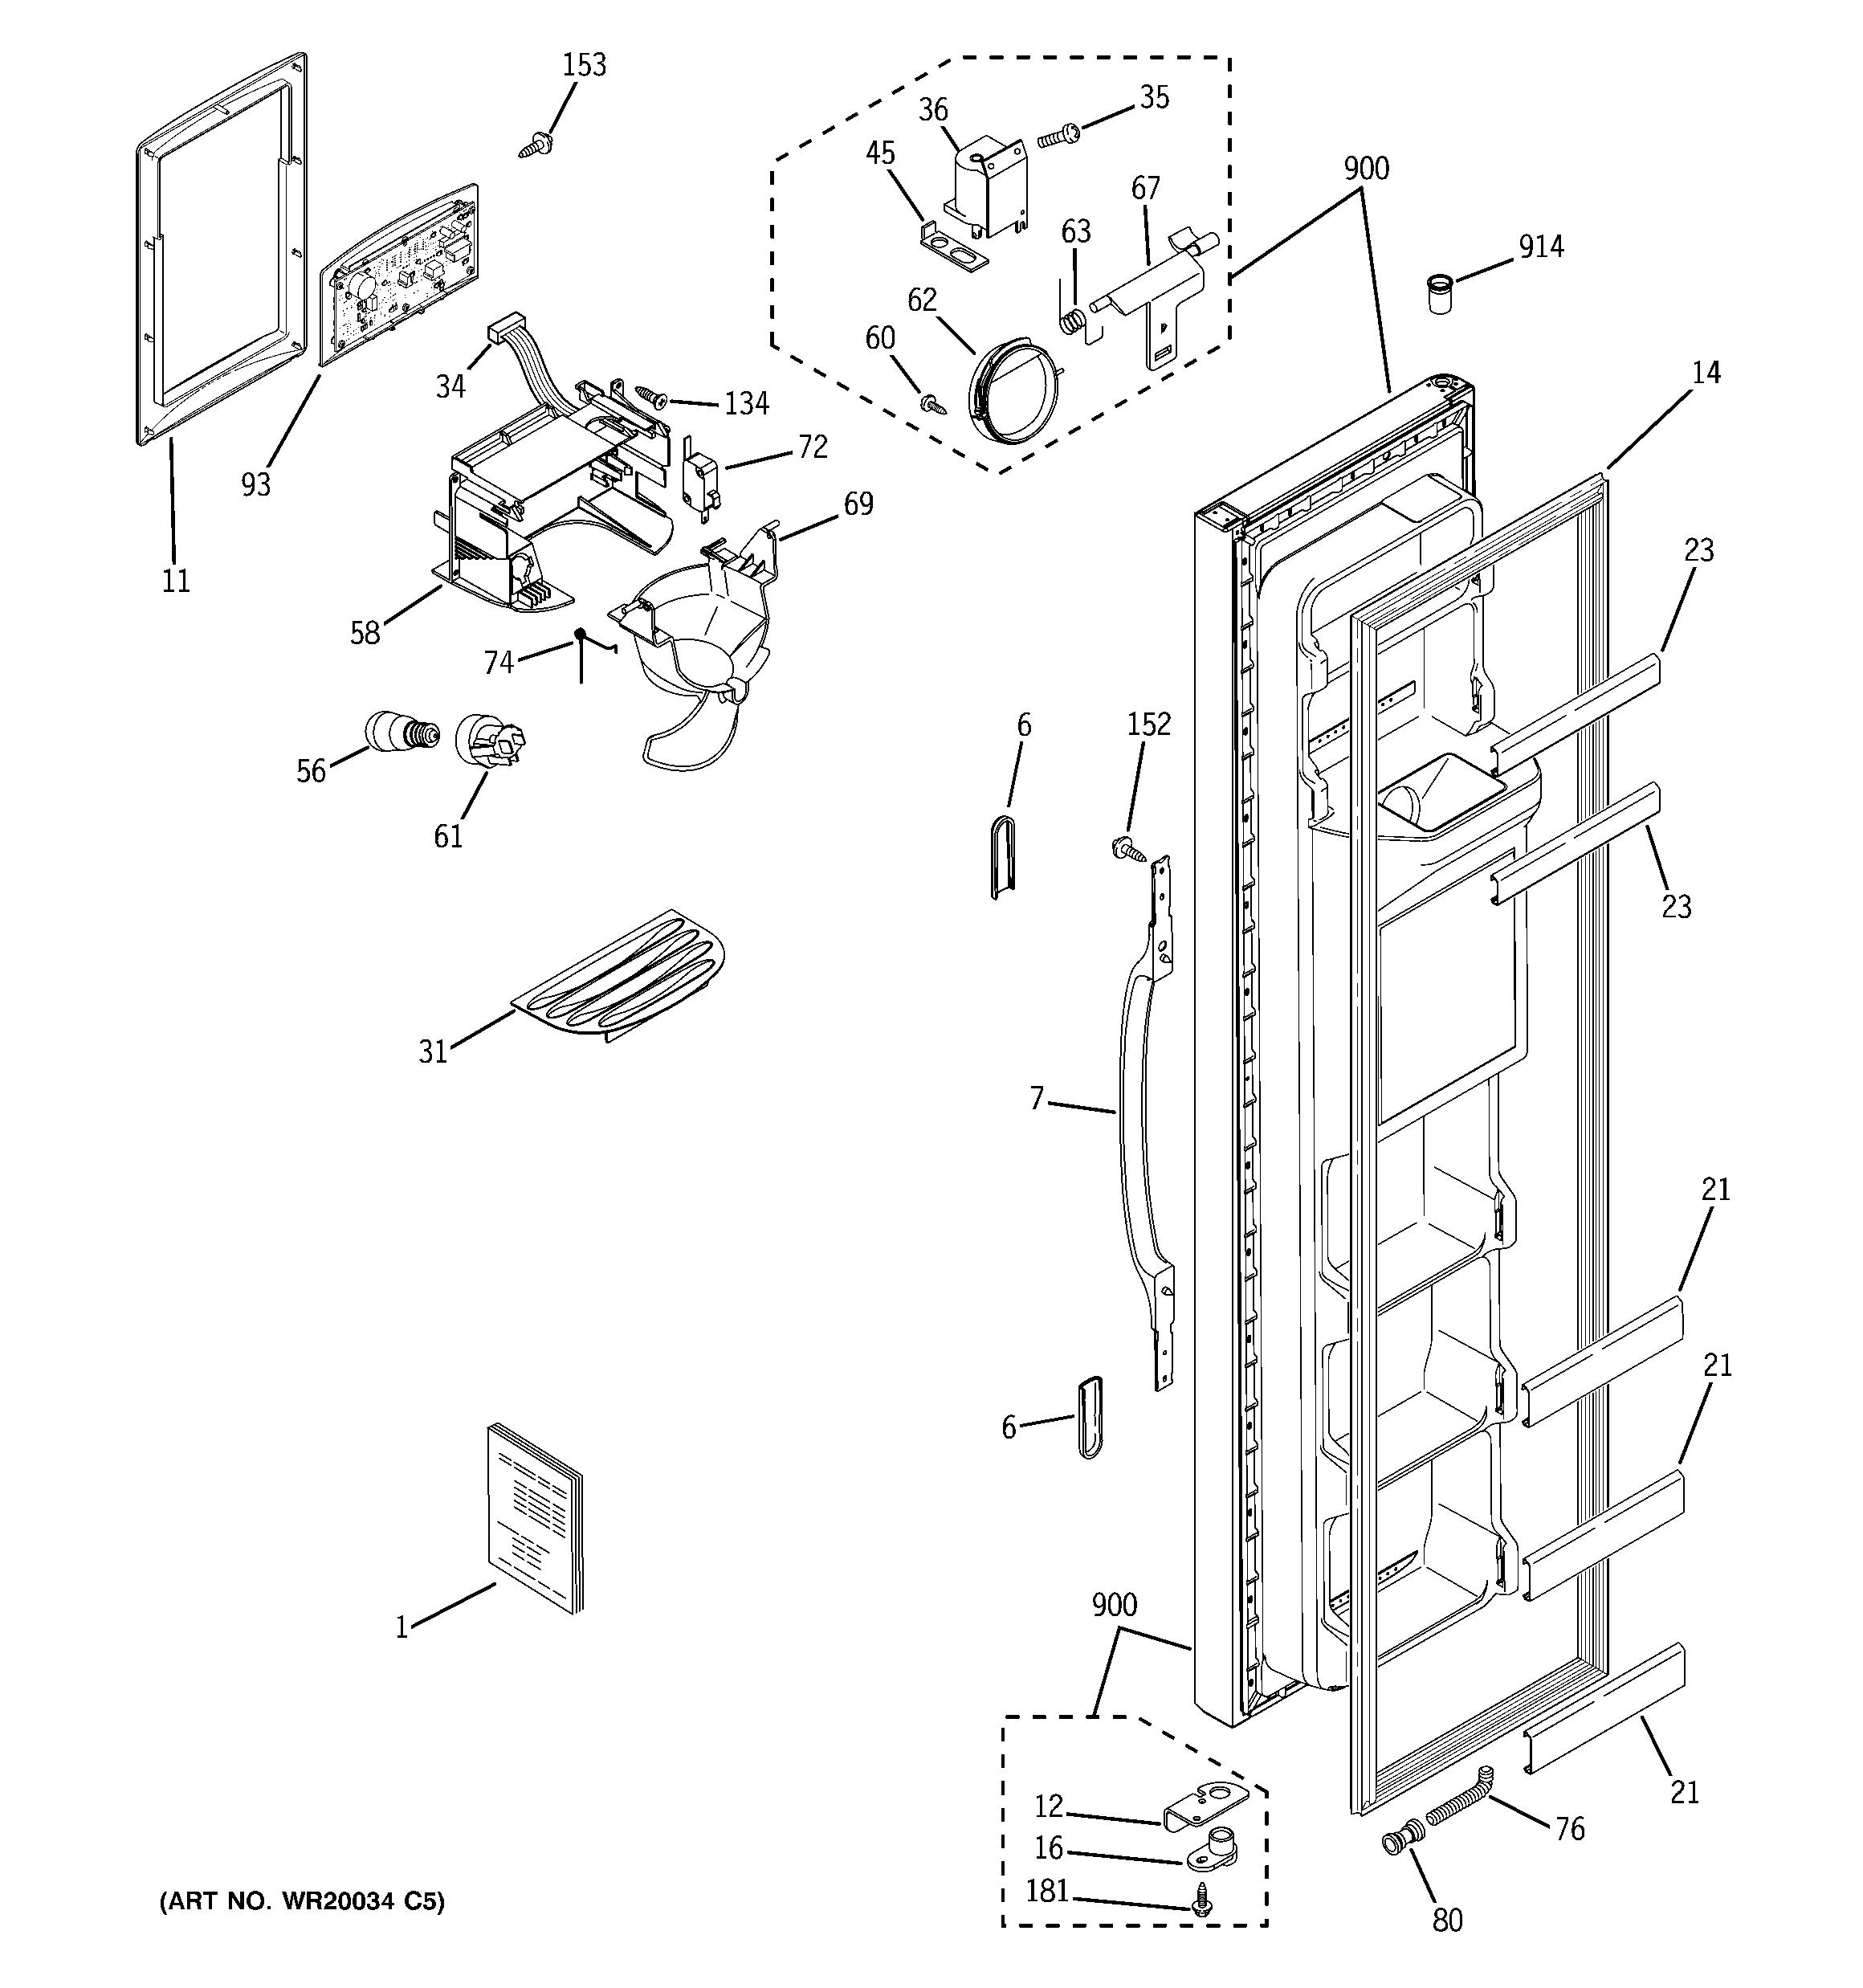 HY_3039] Refrigerator Schematic Diagram On Ge Hotpoint Refrigerator  Schematic Wiring Diagram   Ge Hotpoint Refrigerator Wiring Diagram      Dext Xempag Oupli Proe Mohammedshrine Librar Wiring 101